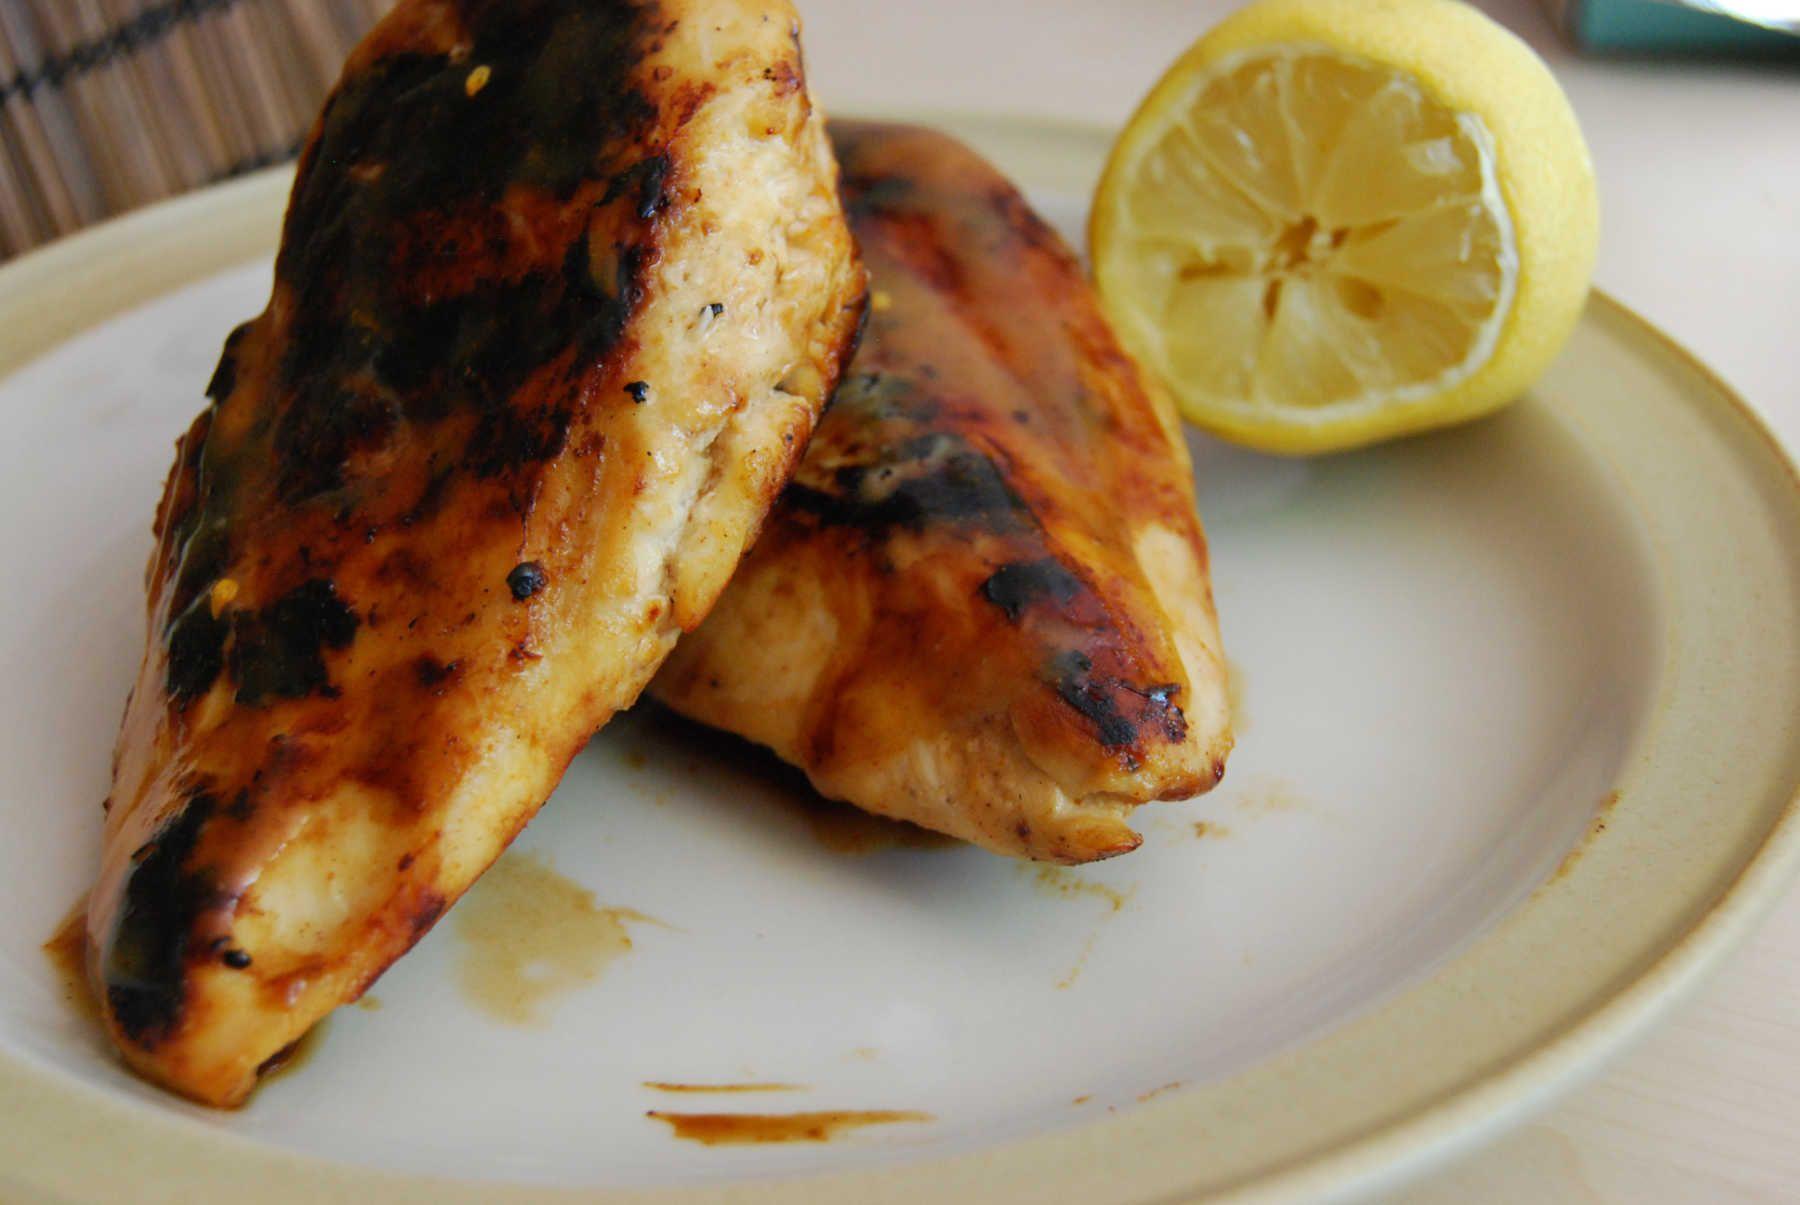 Summery mustard and honey grilled chicken